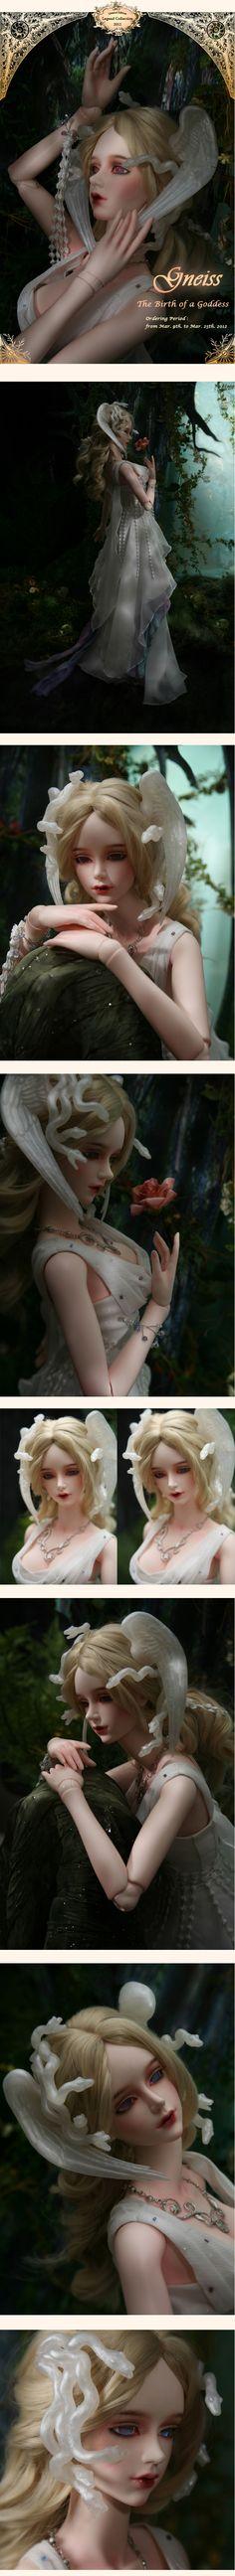 Gneiss - The Birth of a Goddess [Gneiss] - $269.00 : BJD baby,bjd dolls,bjd doll shop,bjd bragan?a,fairyland,volks bjd,soom,luts bjd,Super Dollfie, BJD lovers collect community